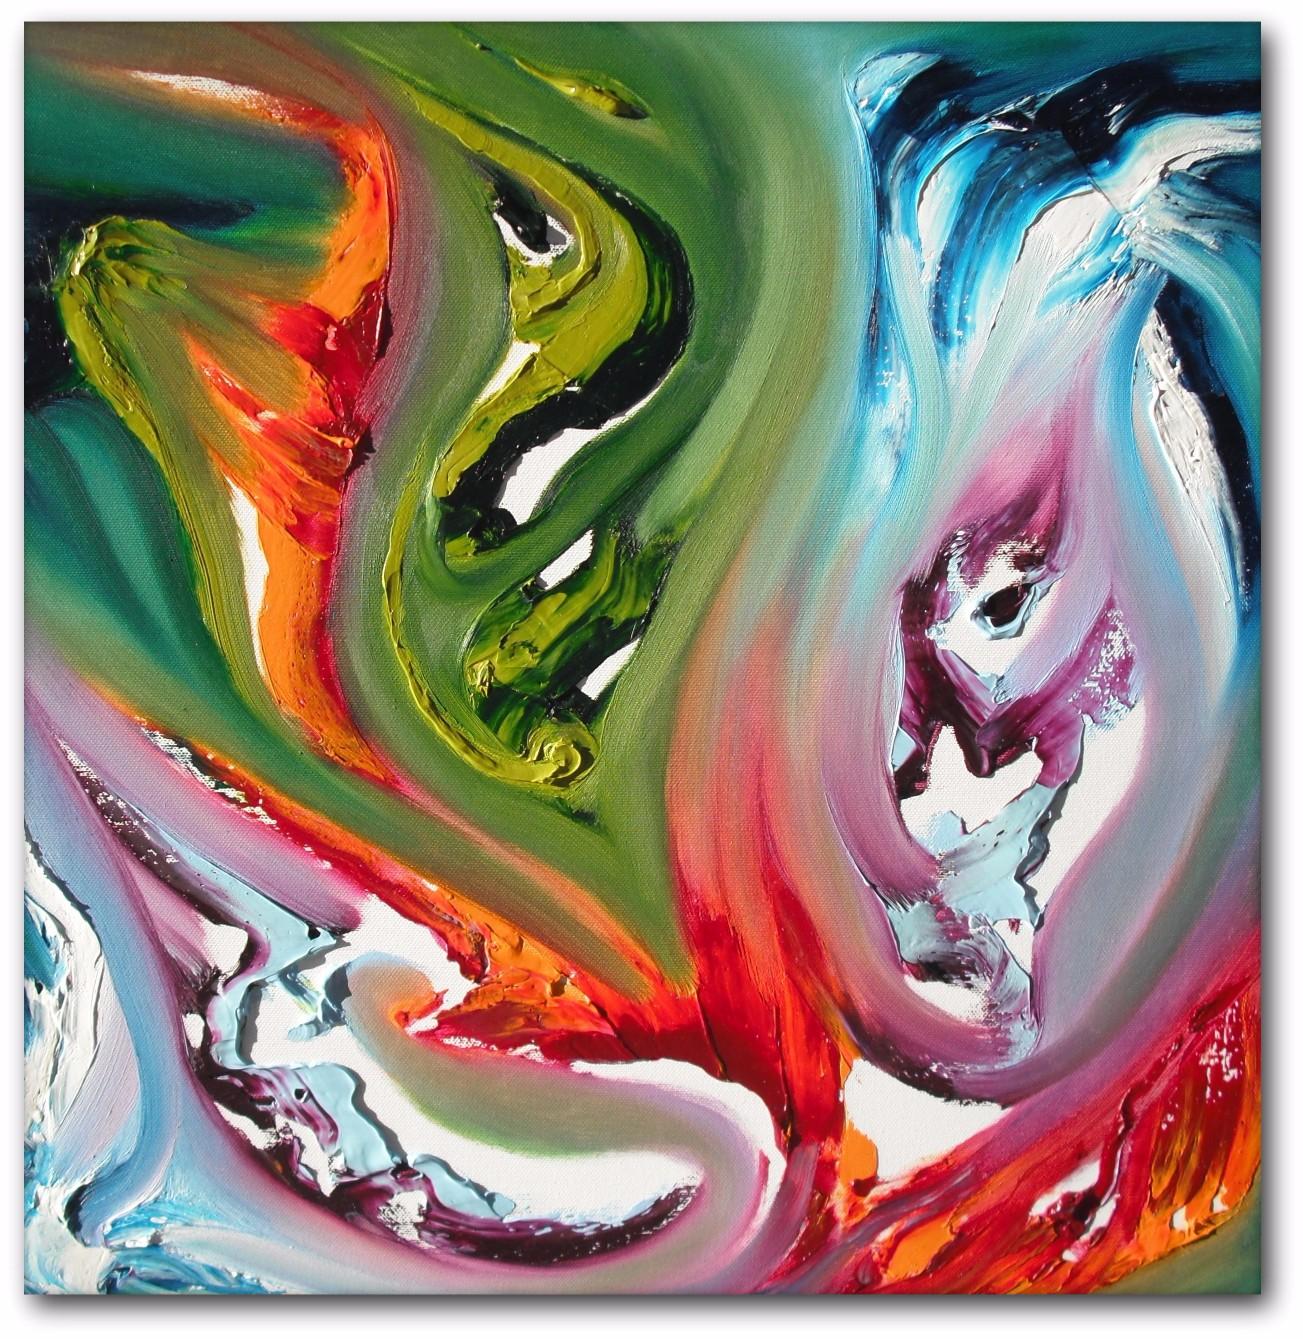 Moods triptych dipinto astratto moderno in vendita